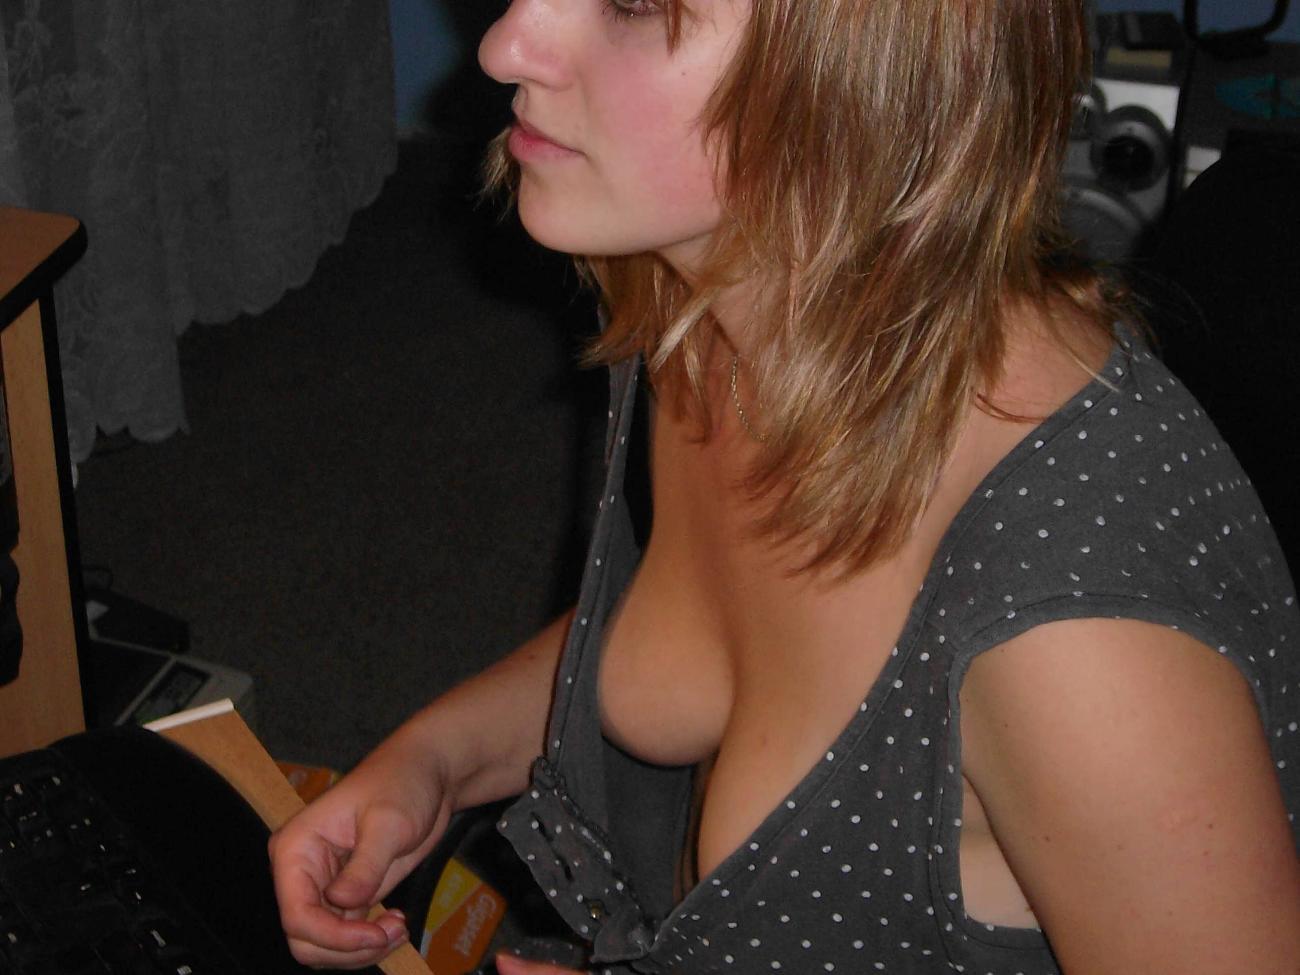 Nipple Slip Nude Throat Tits Estonoesyugoslavia